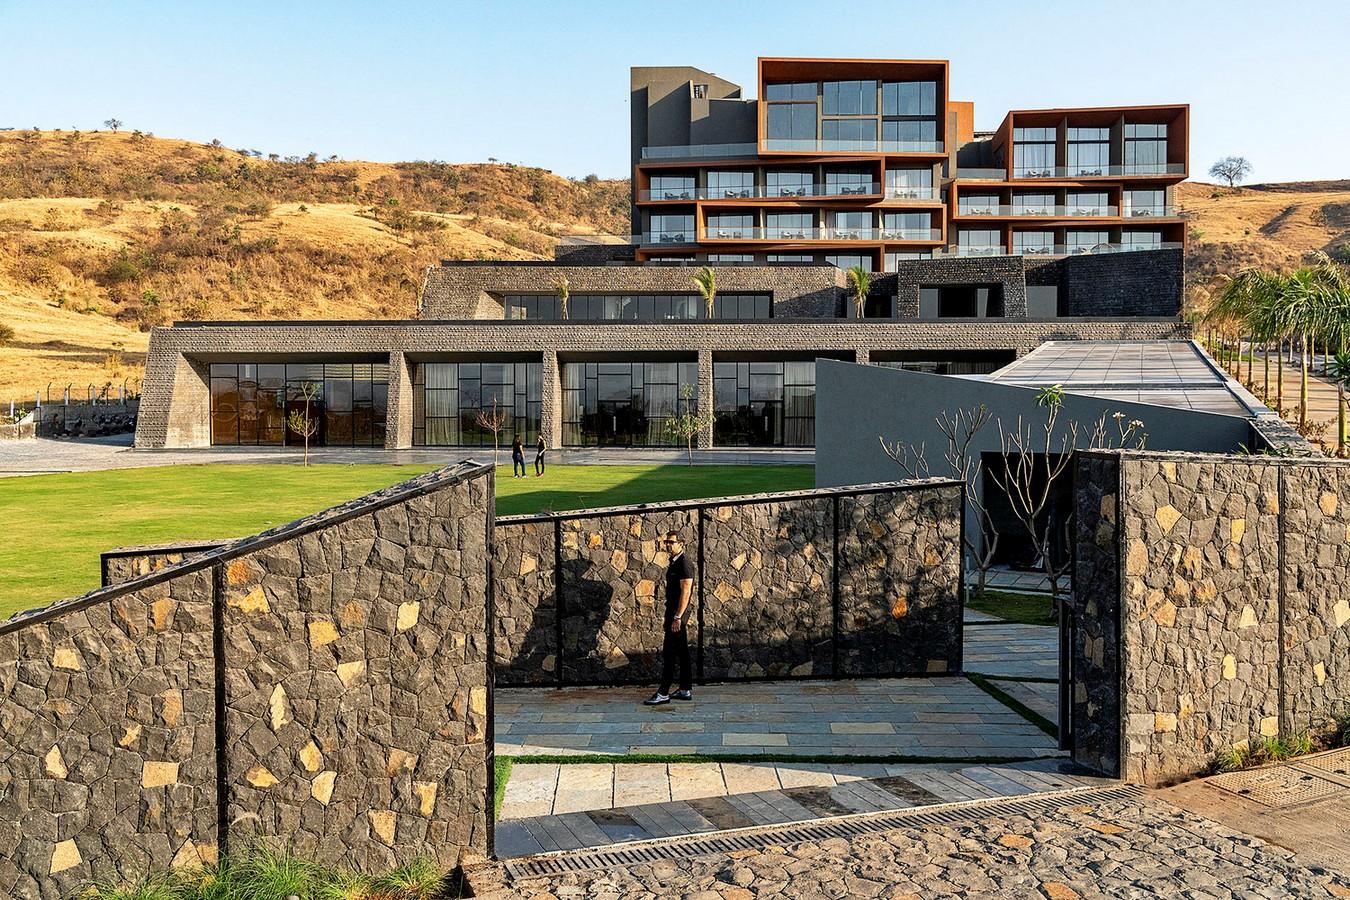 Aria Hotel by Sanjay Puri Architects: Capturing the Beauty - Sheet1